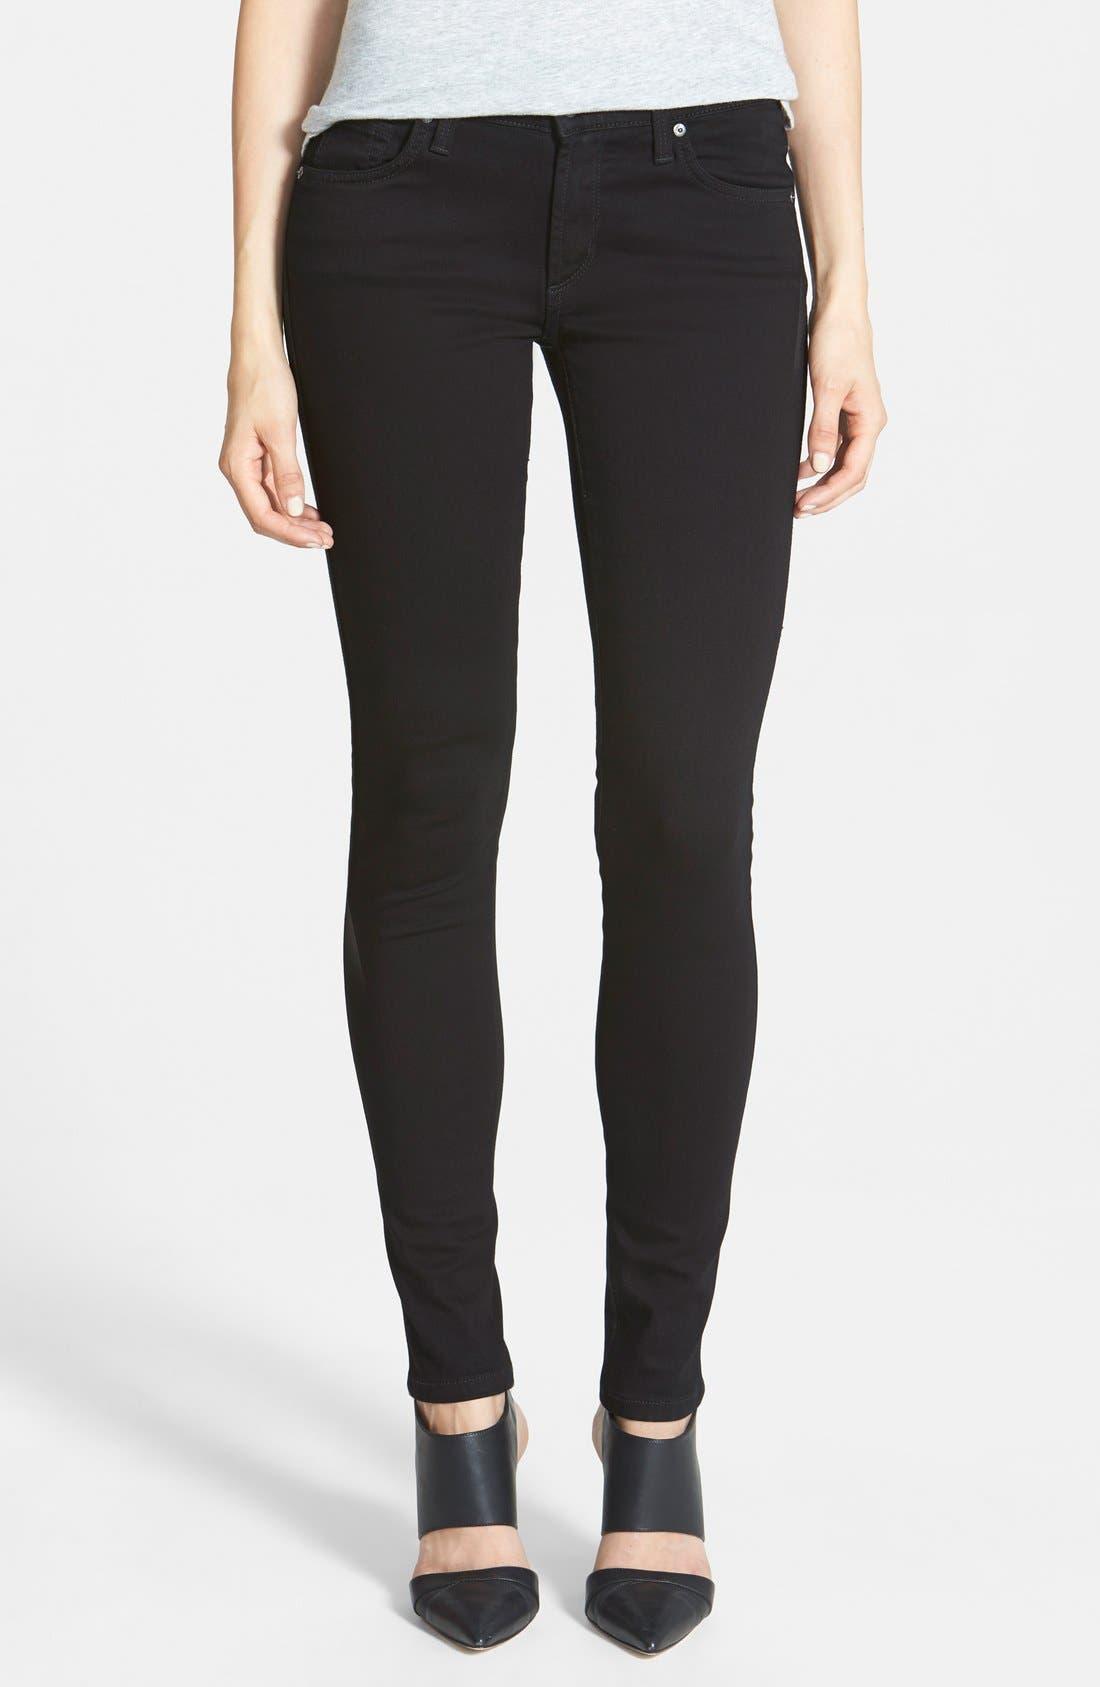 Main Image - James Jeans 'Twiggy' Five Pocket Leggings (Black Clean)